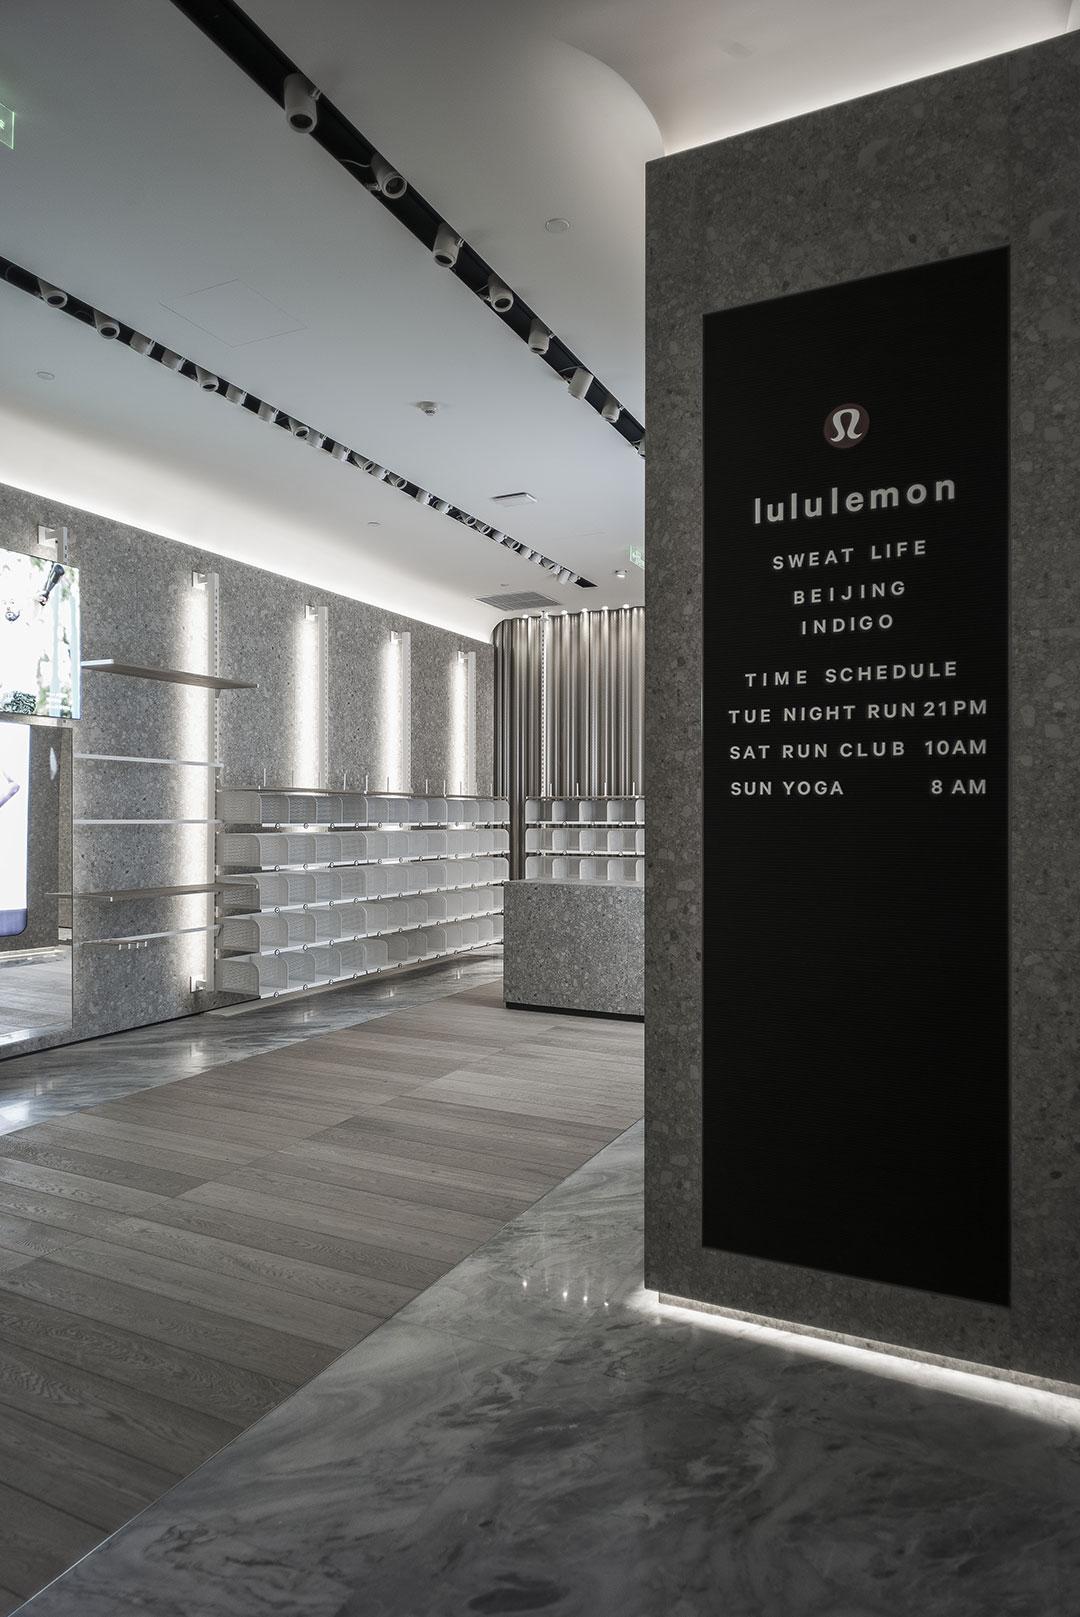 lululemon_BeijingIndigo_3